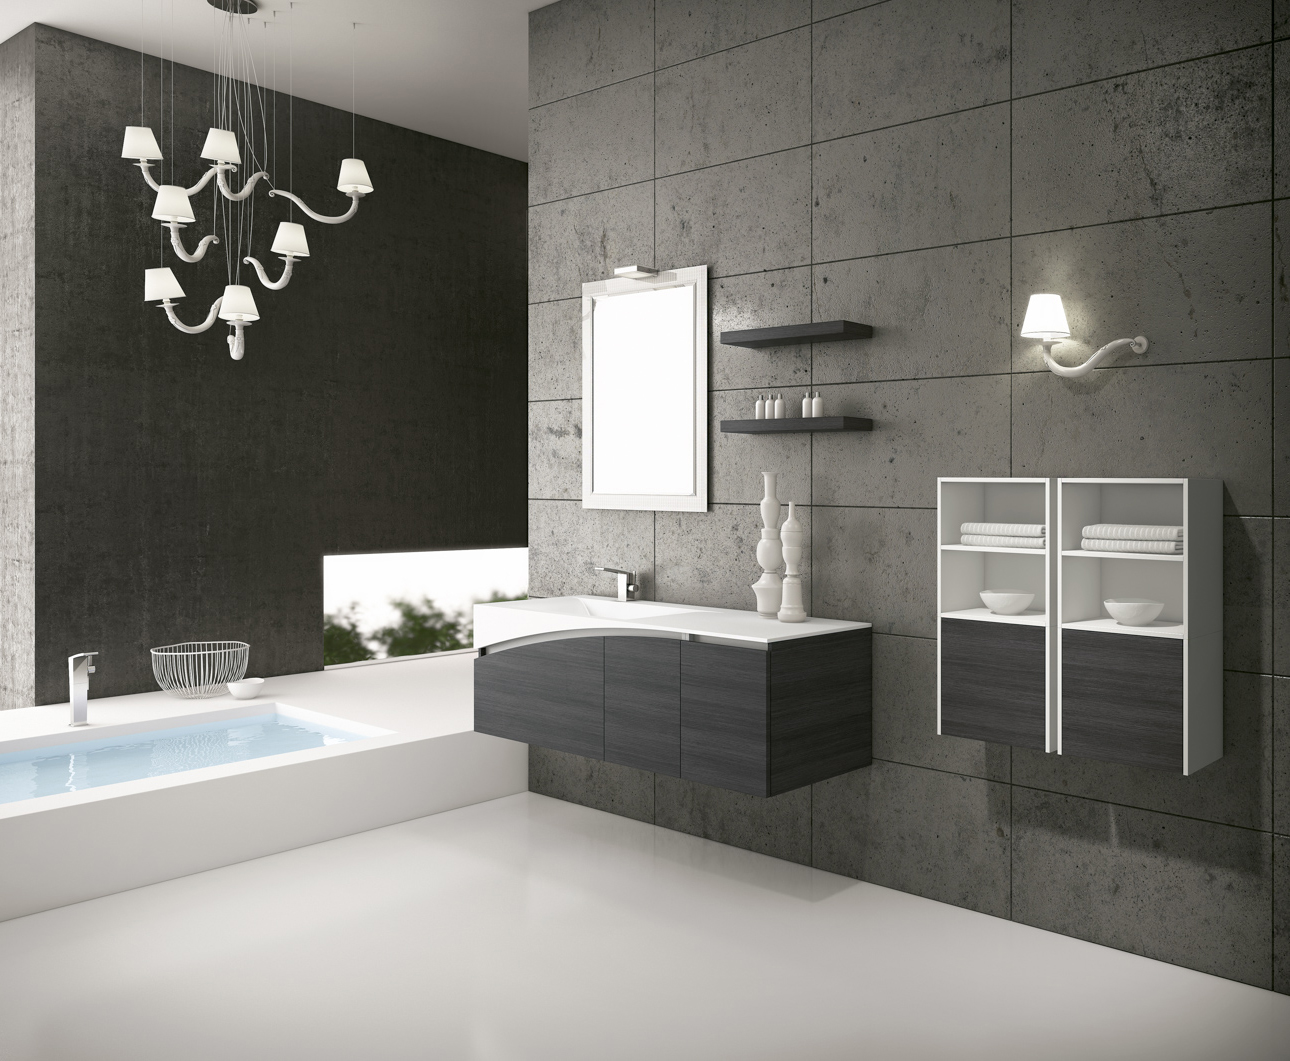 https://www.mobiliriva.it/wp-content/uploads/2020/06/bmt-bagni-linea-fly-mobile-lavabo-14-1.jpg